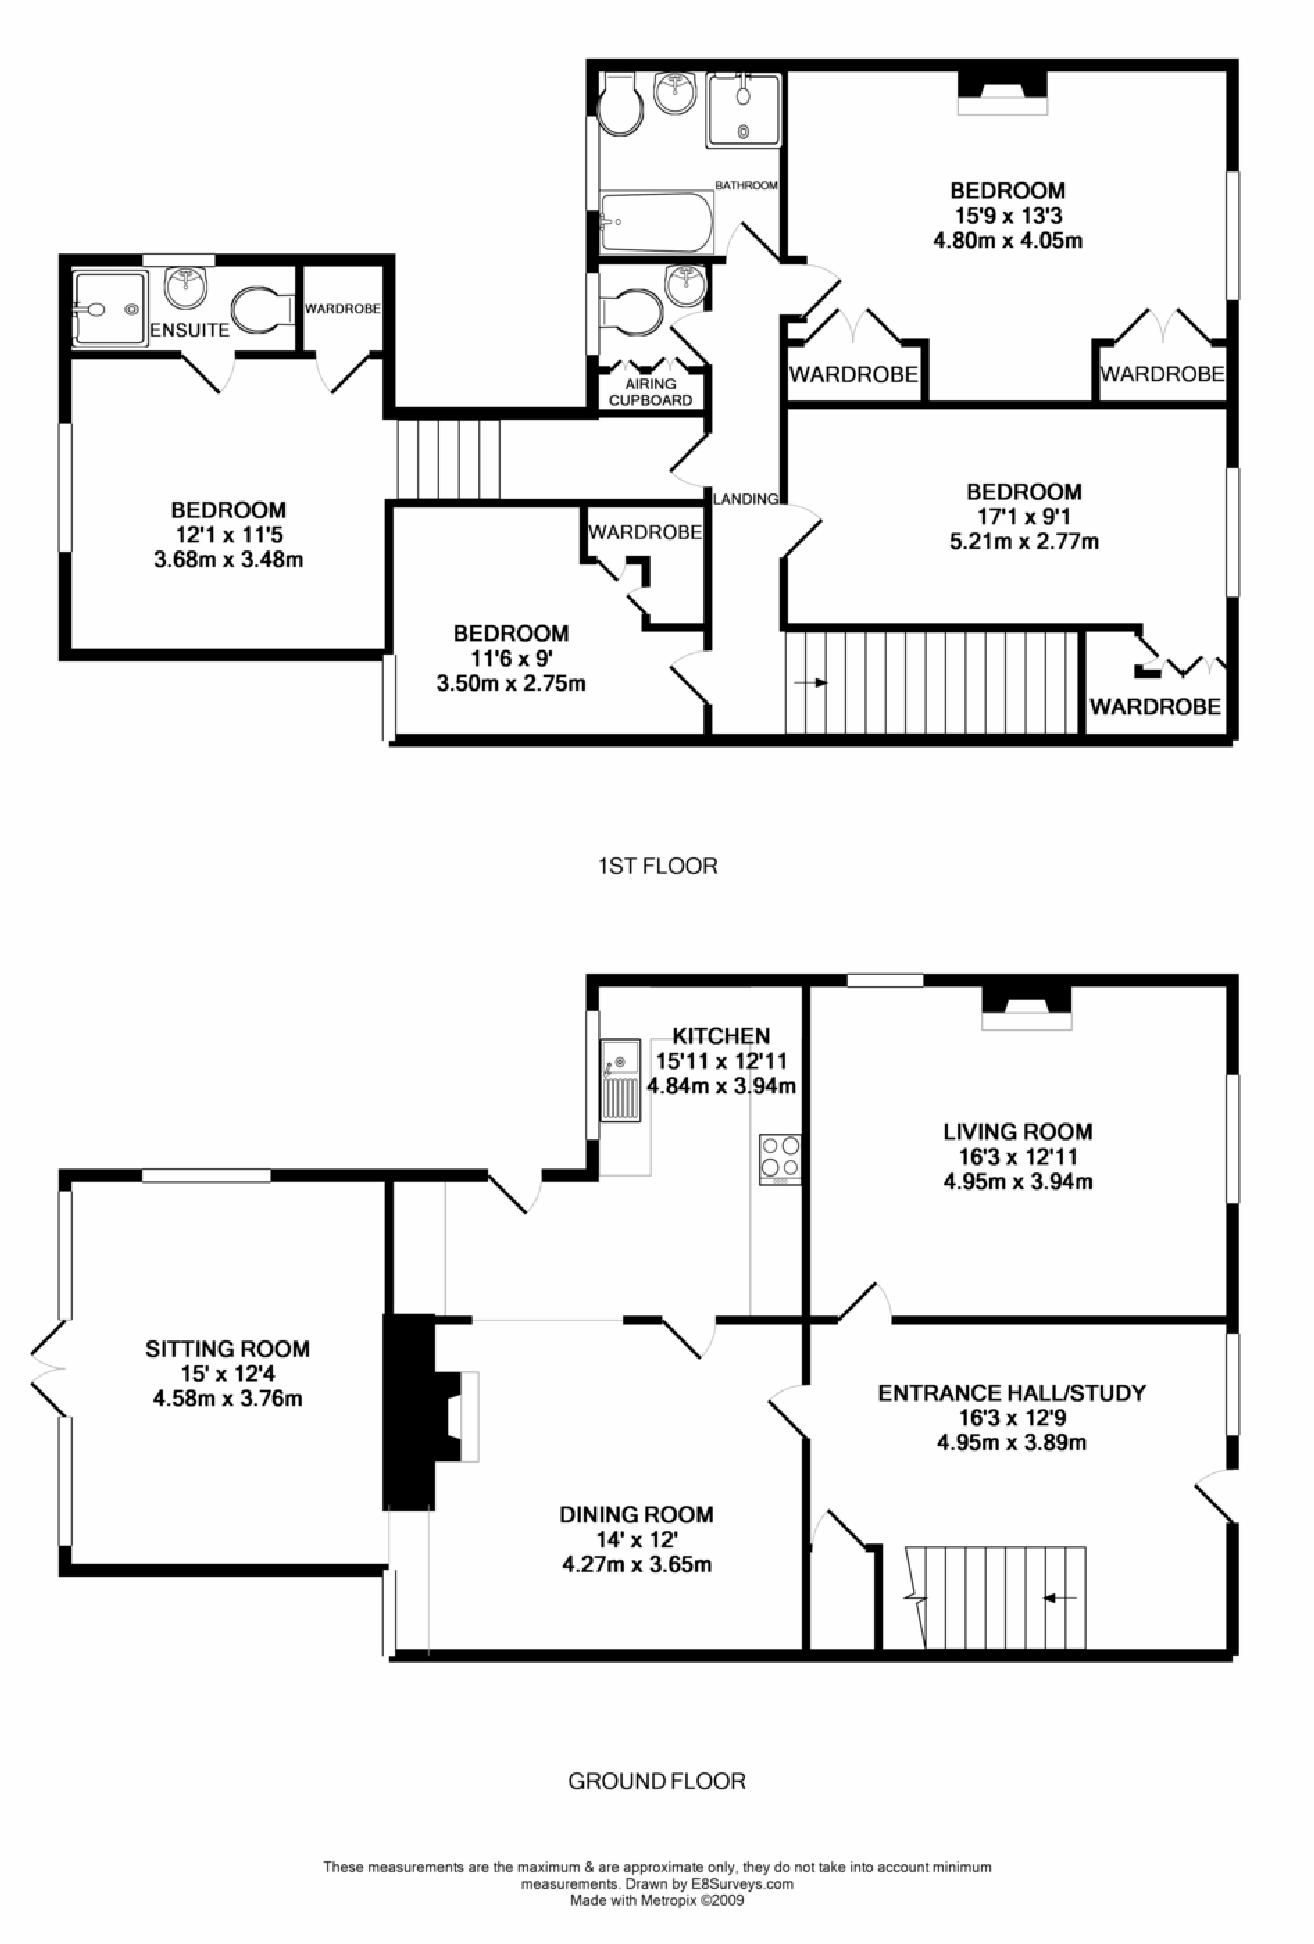 Barndominium Floor Plan Ideas To Make Your Own Home Barndominium Floor Plans Small Barndomin Barndominium Floor Plans Bedroom House Plans Barndominium Plans